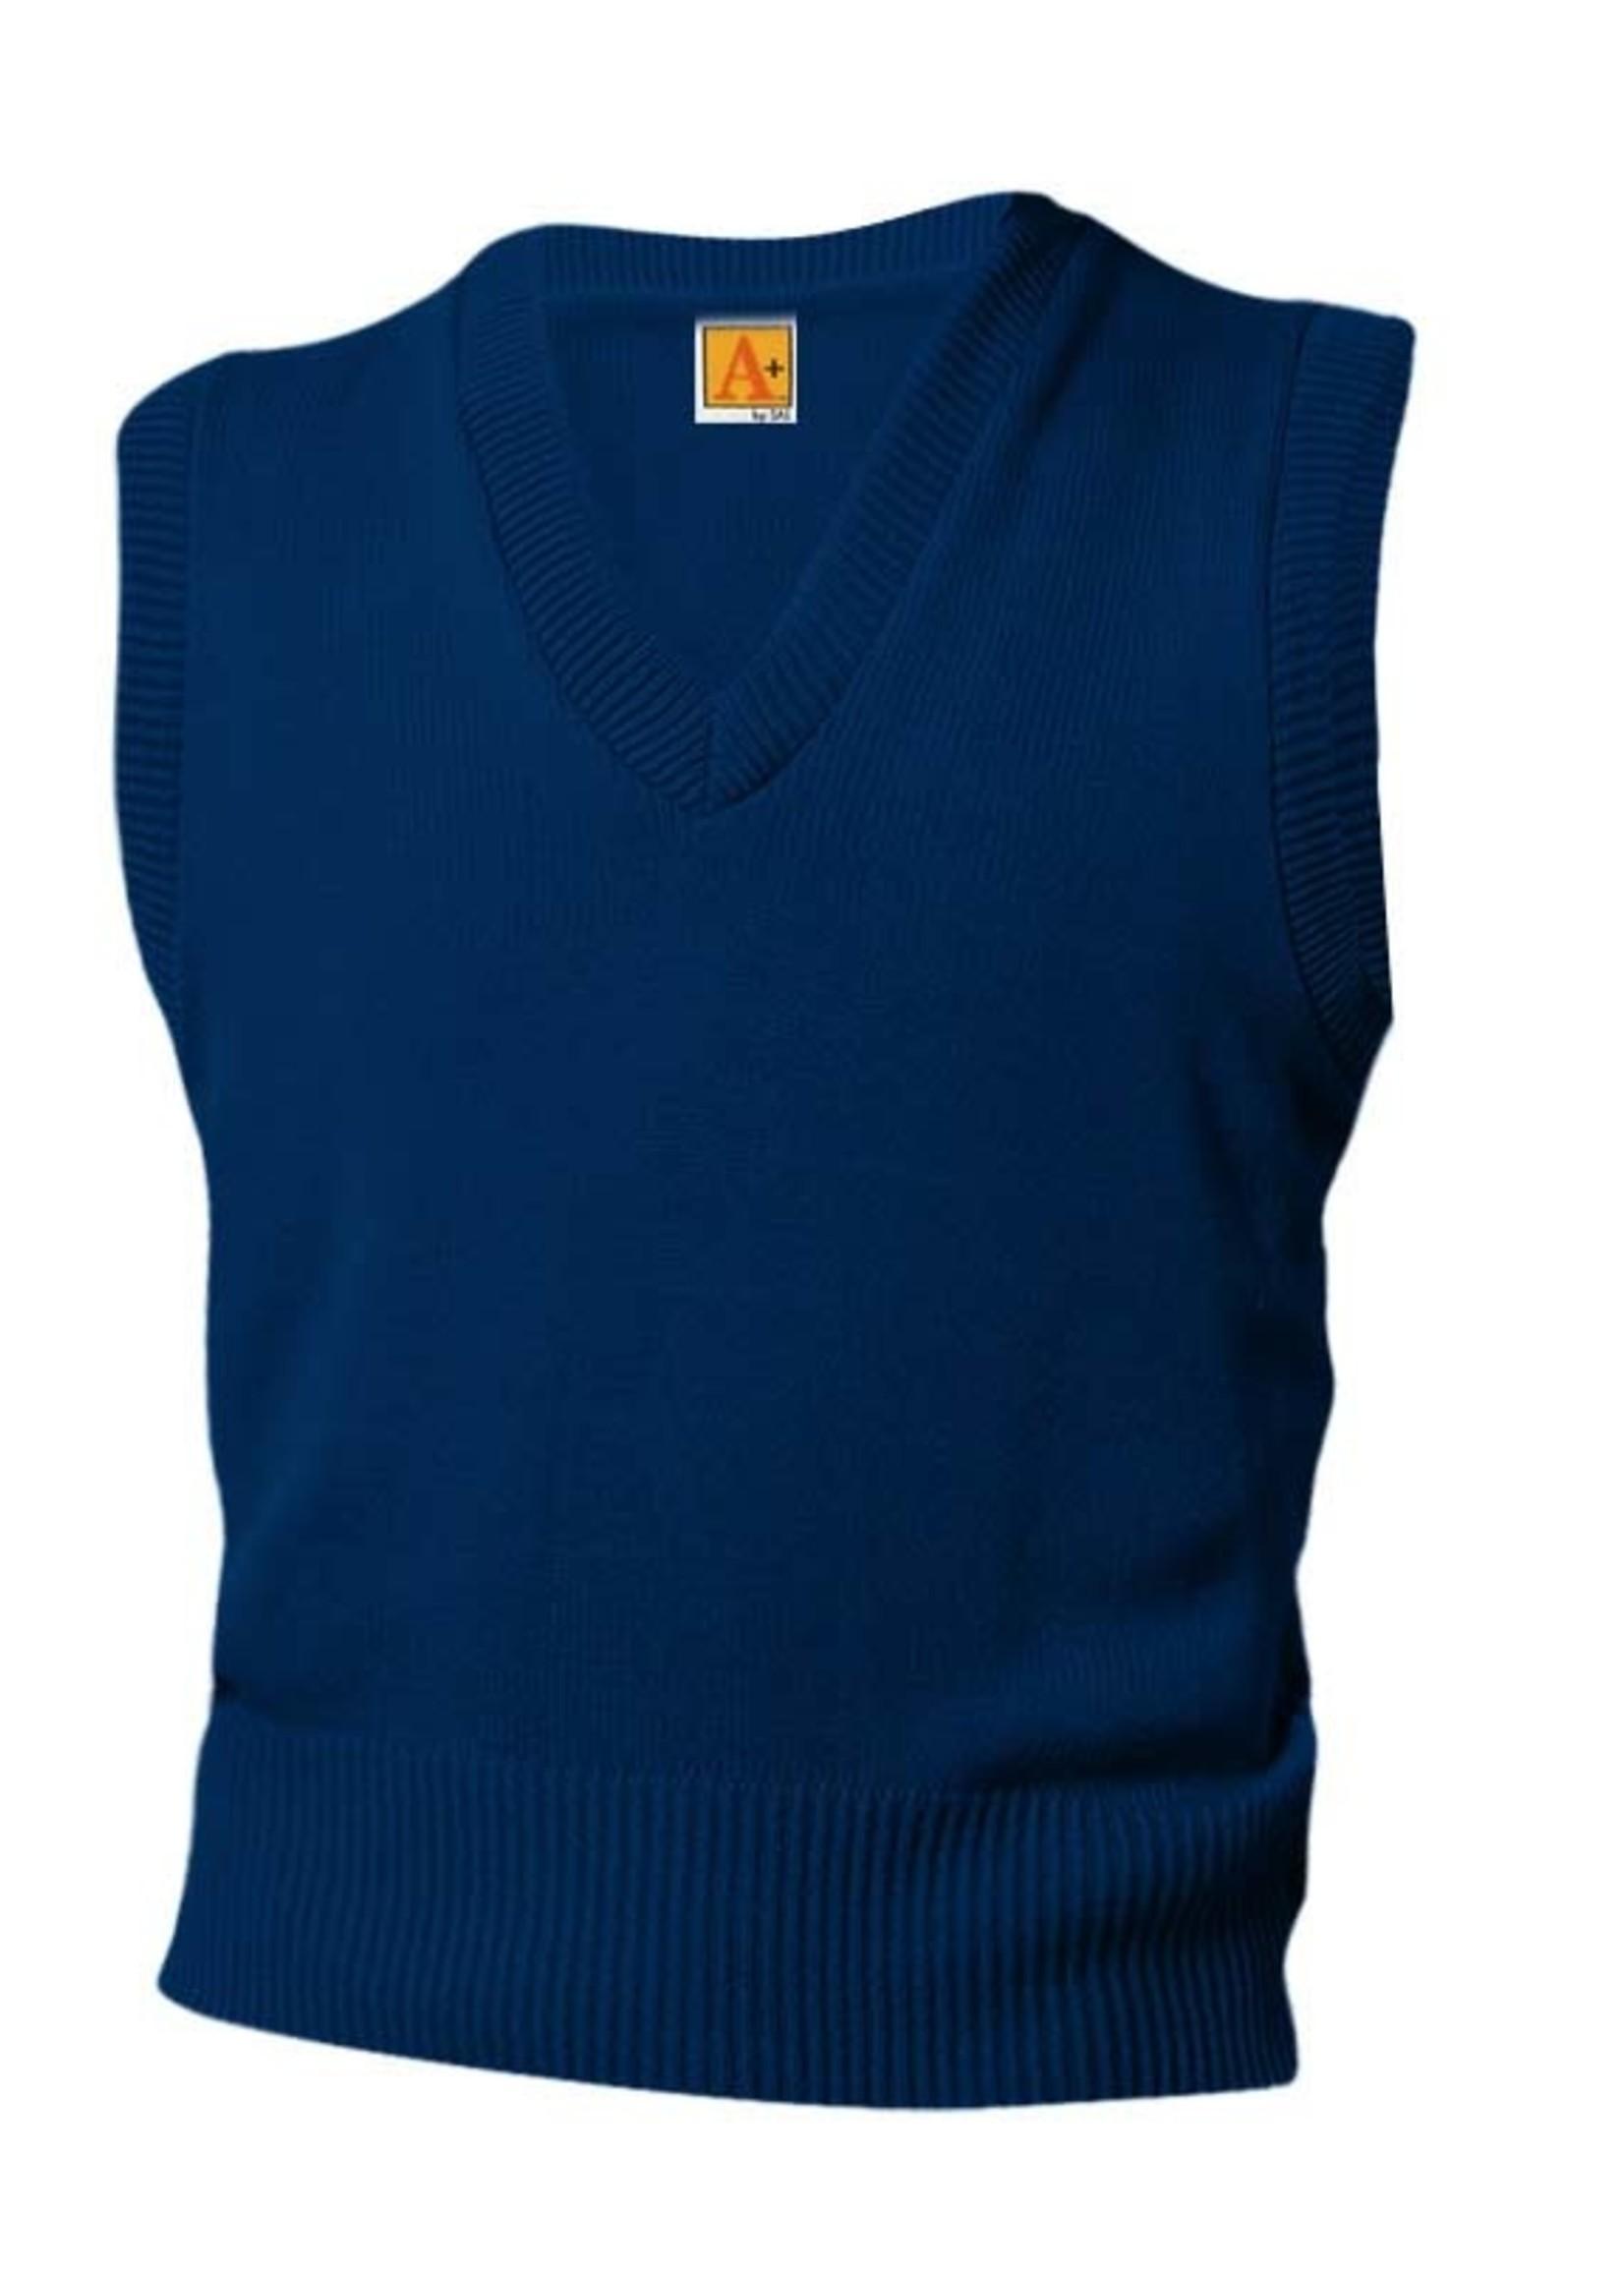 OLMC Navy V-neck sweater vest